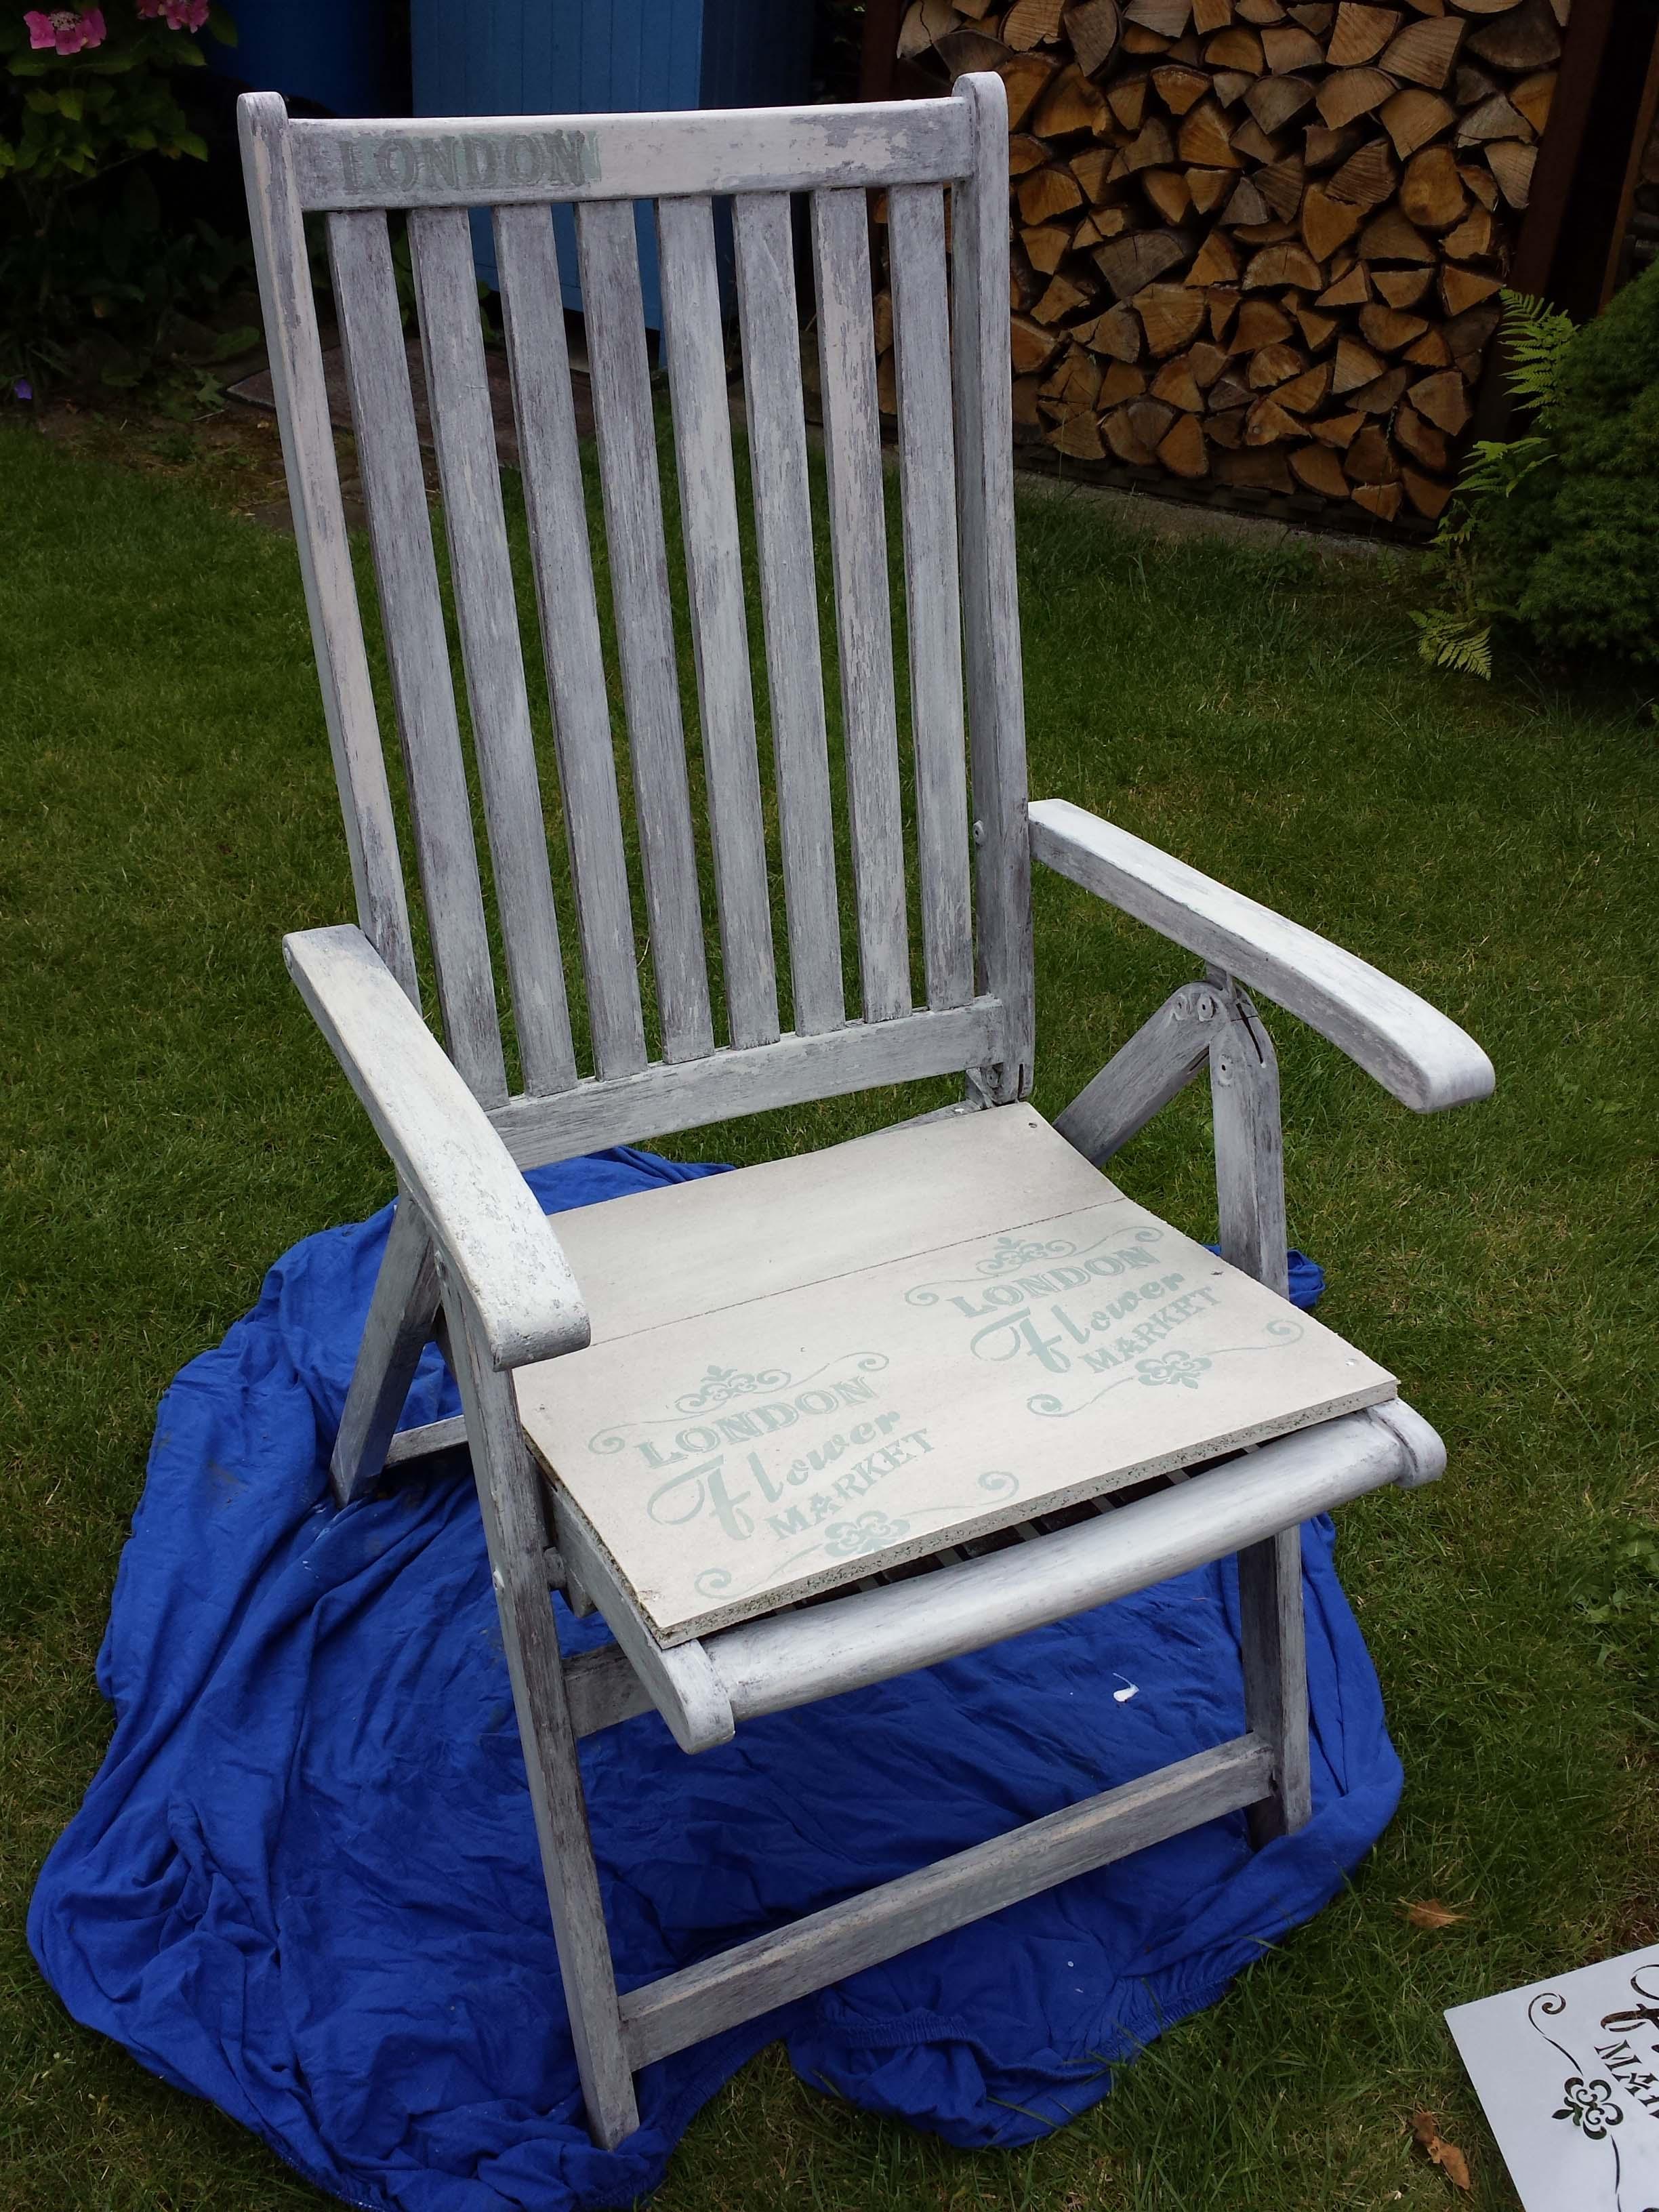 der morsche stuhl leben und genie en enjoy your life. Black Bedroom Furniture Sets. Home Design Ideas